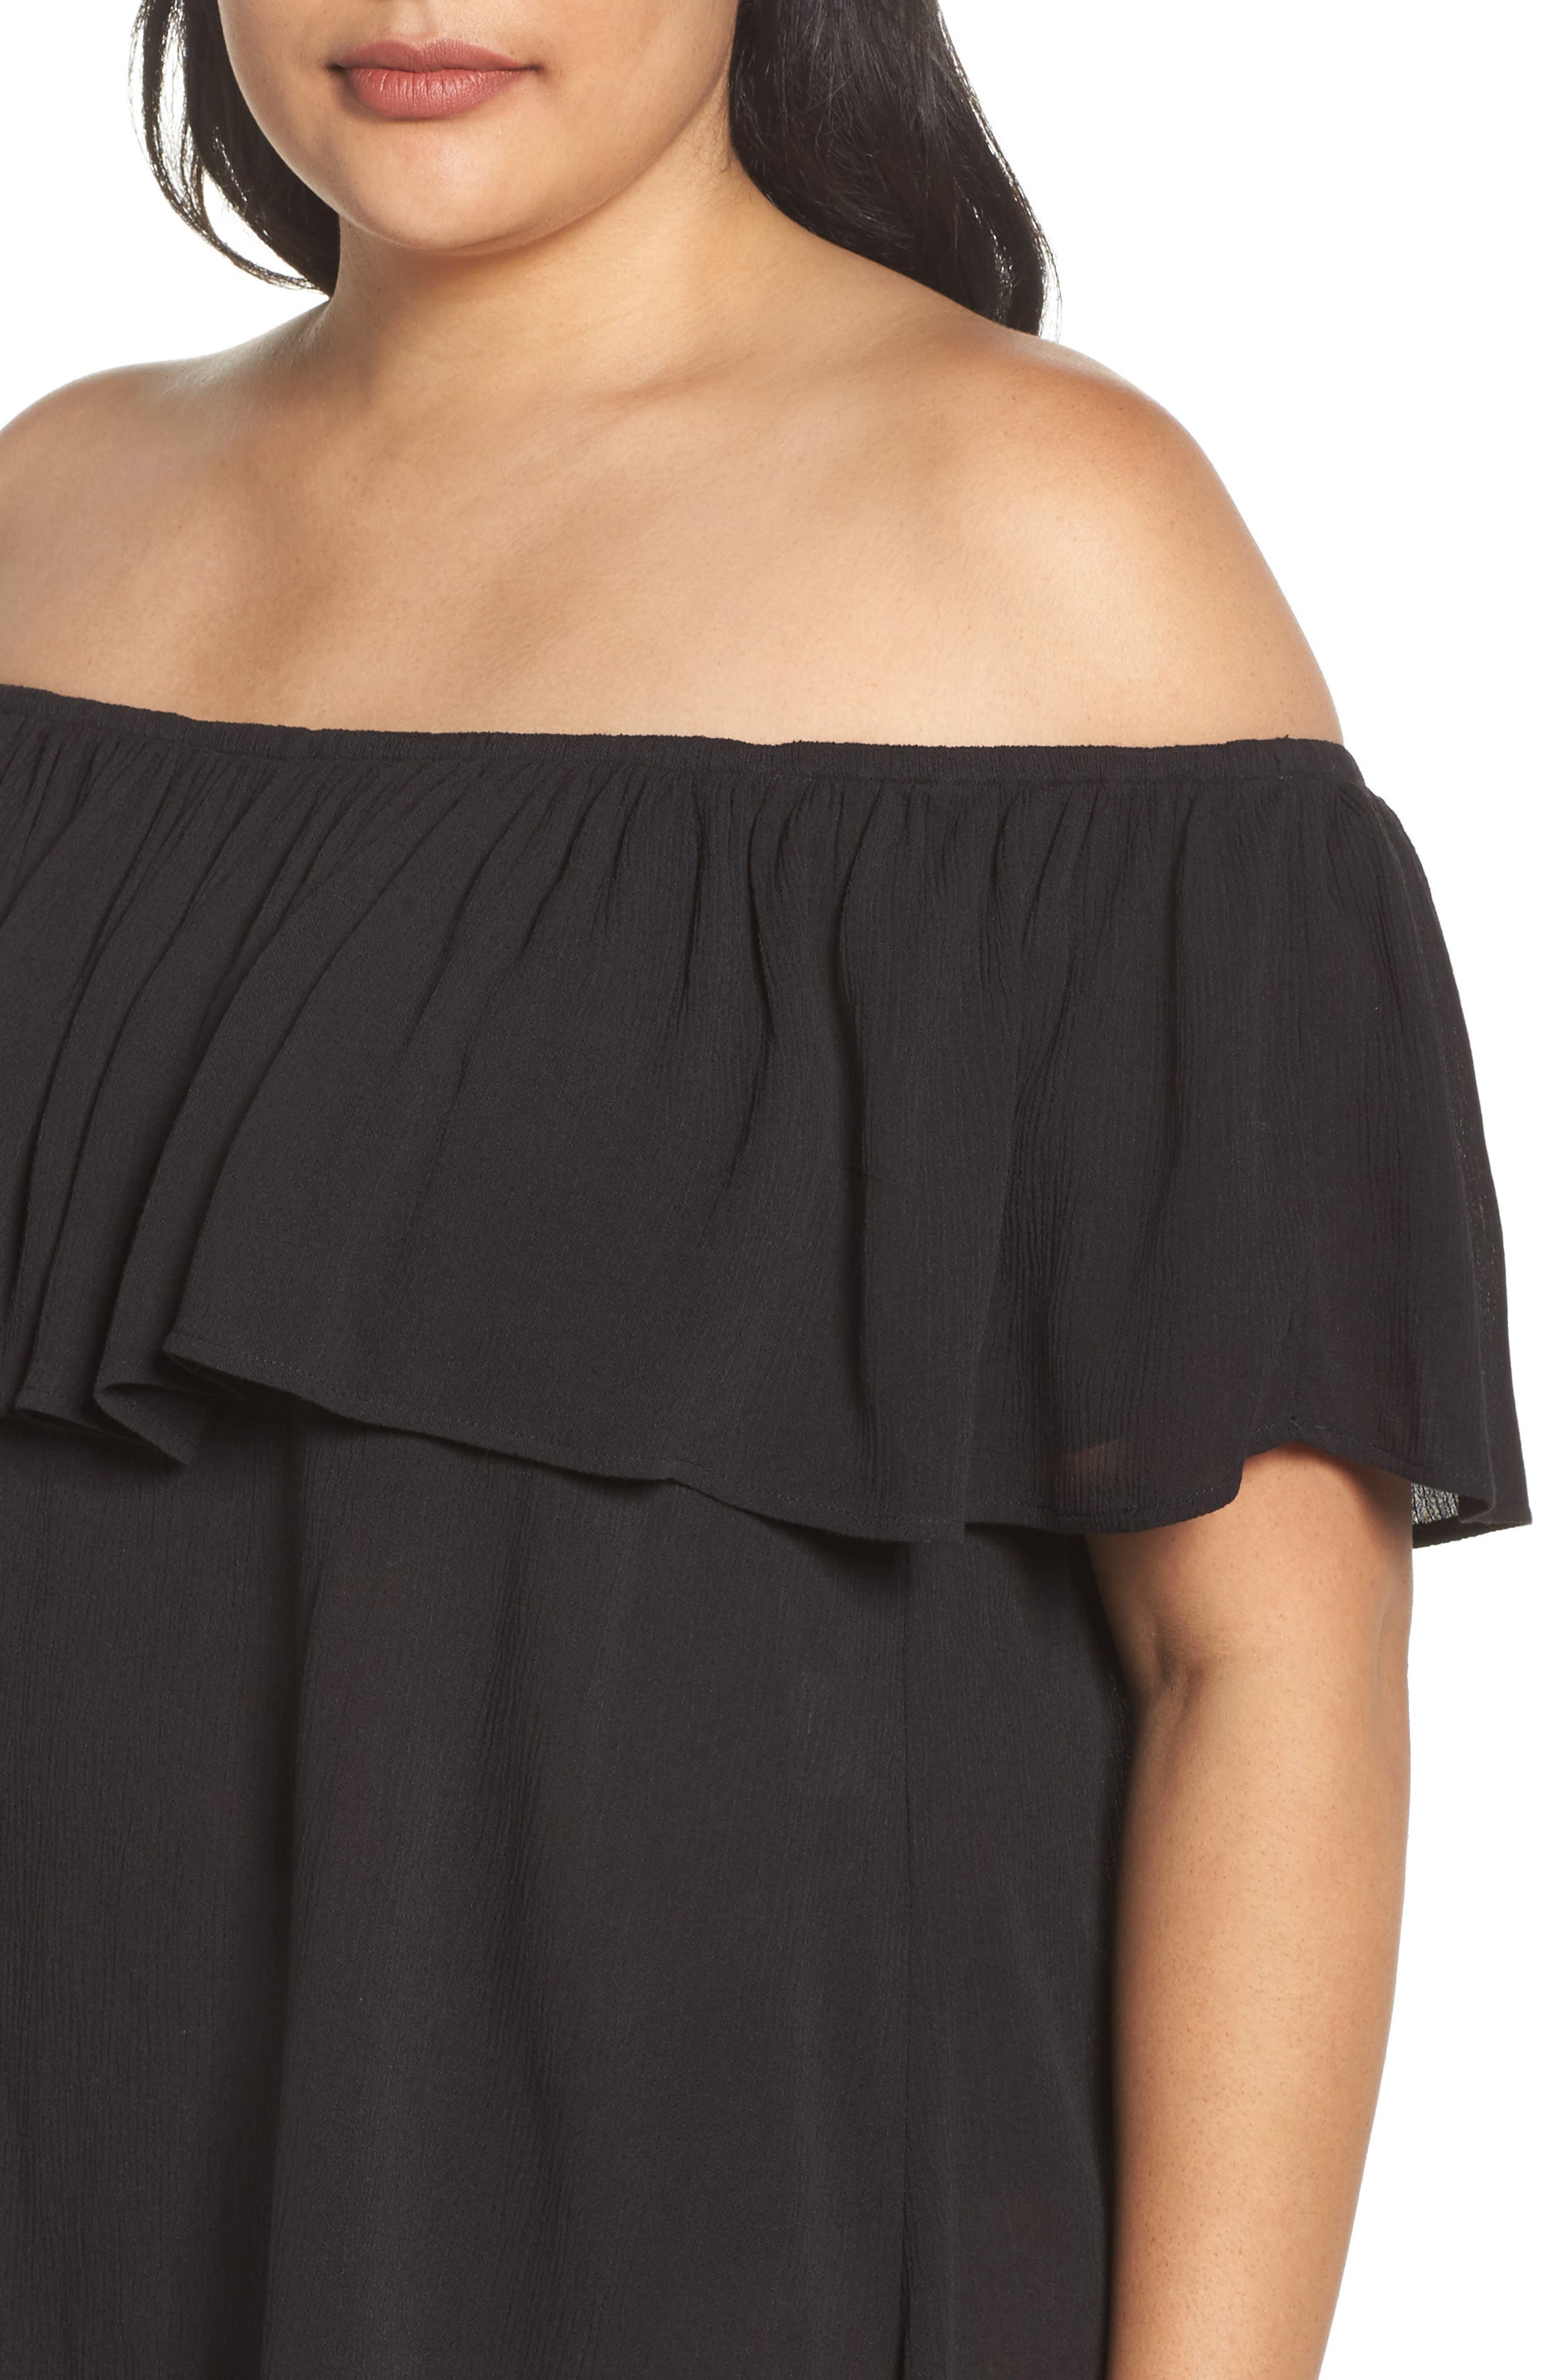 Alternate Image 4  - Becca Etc. Southern Belle Off the Shoulder Cover-Up Dress (Plus Size)